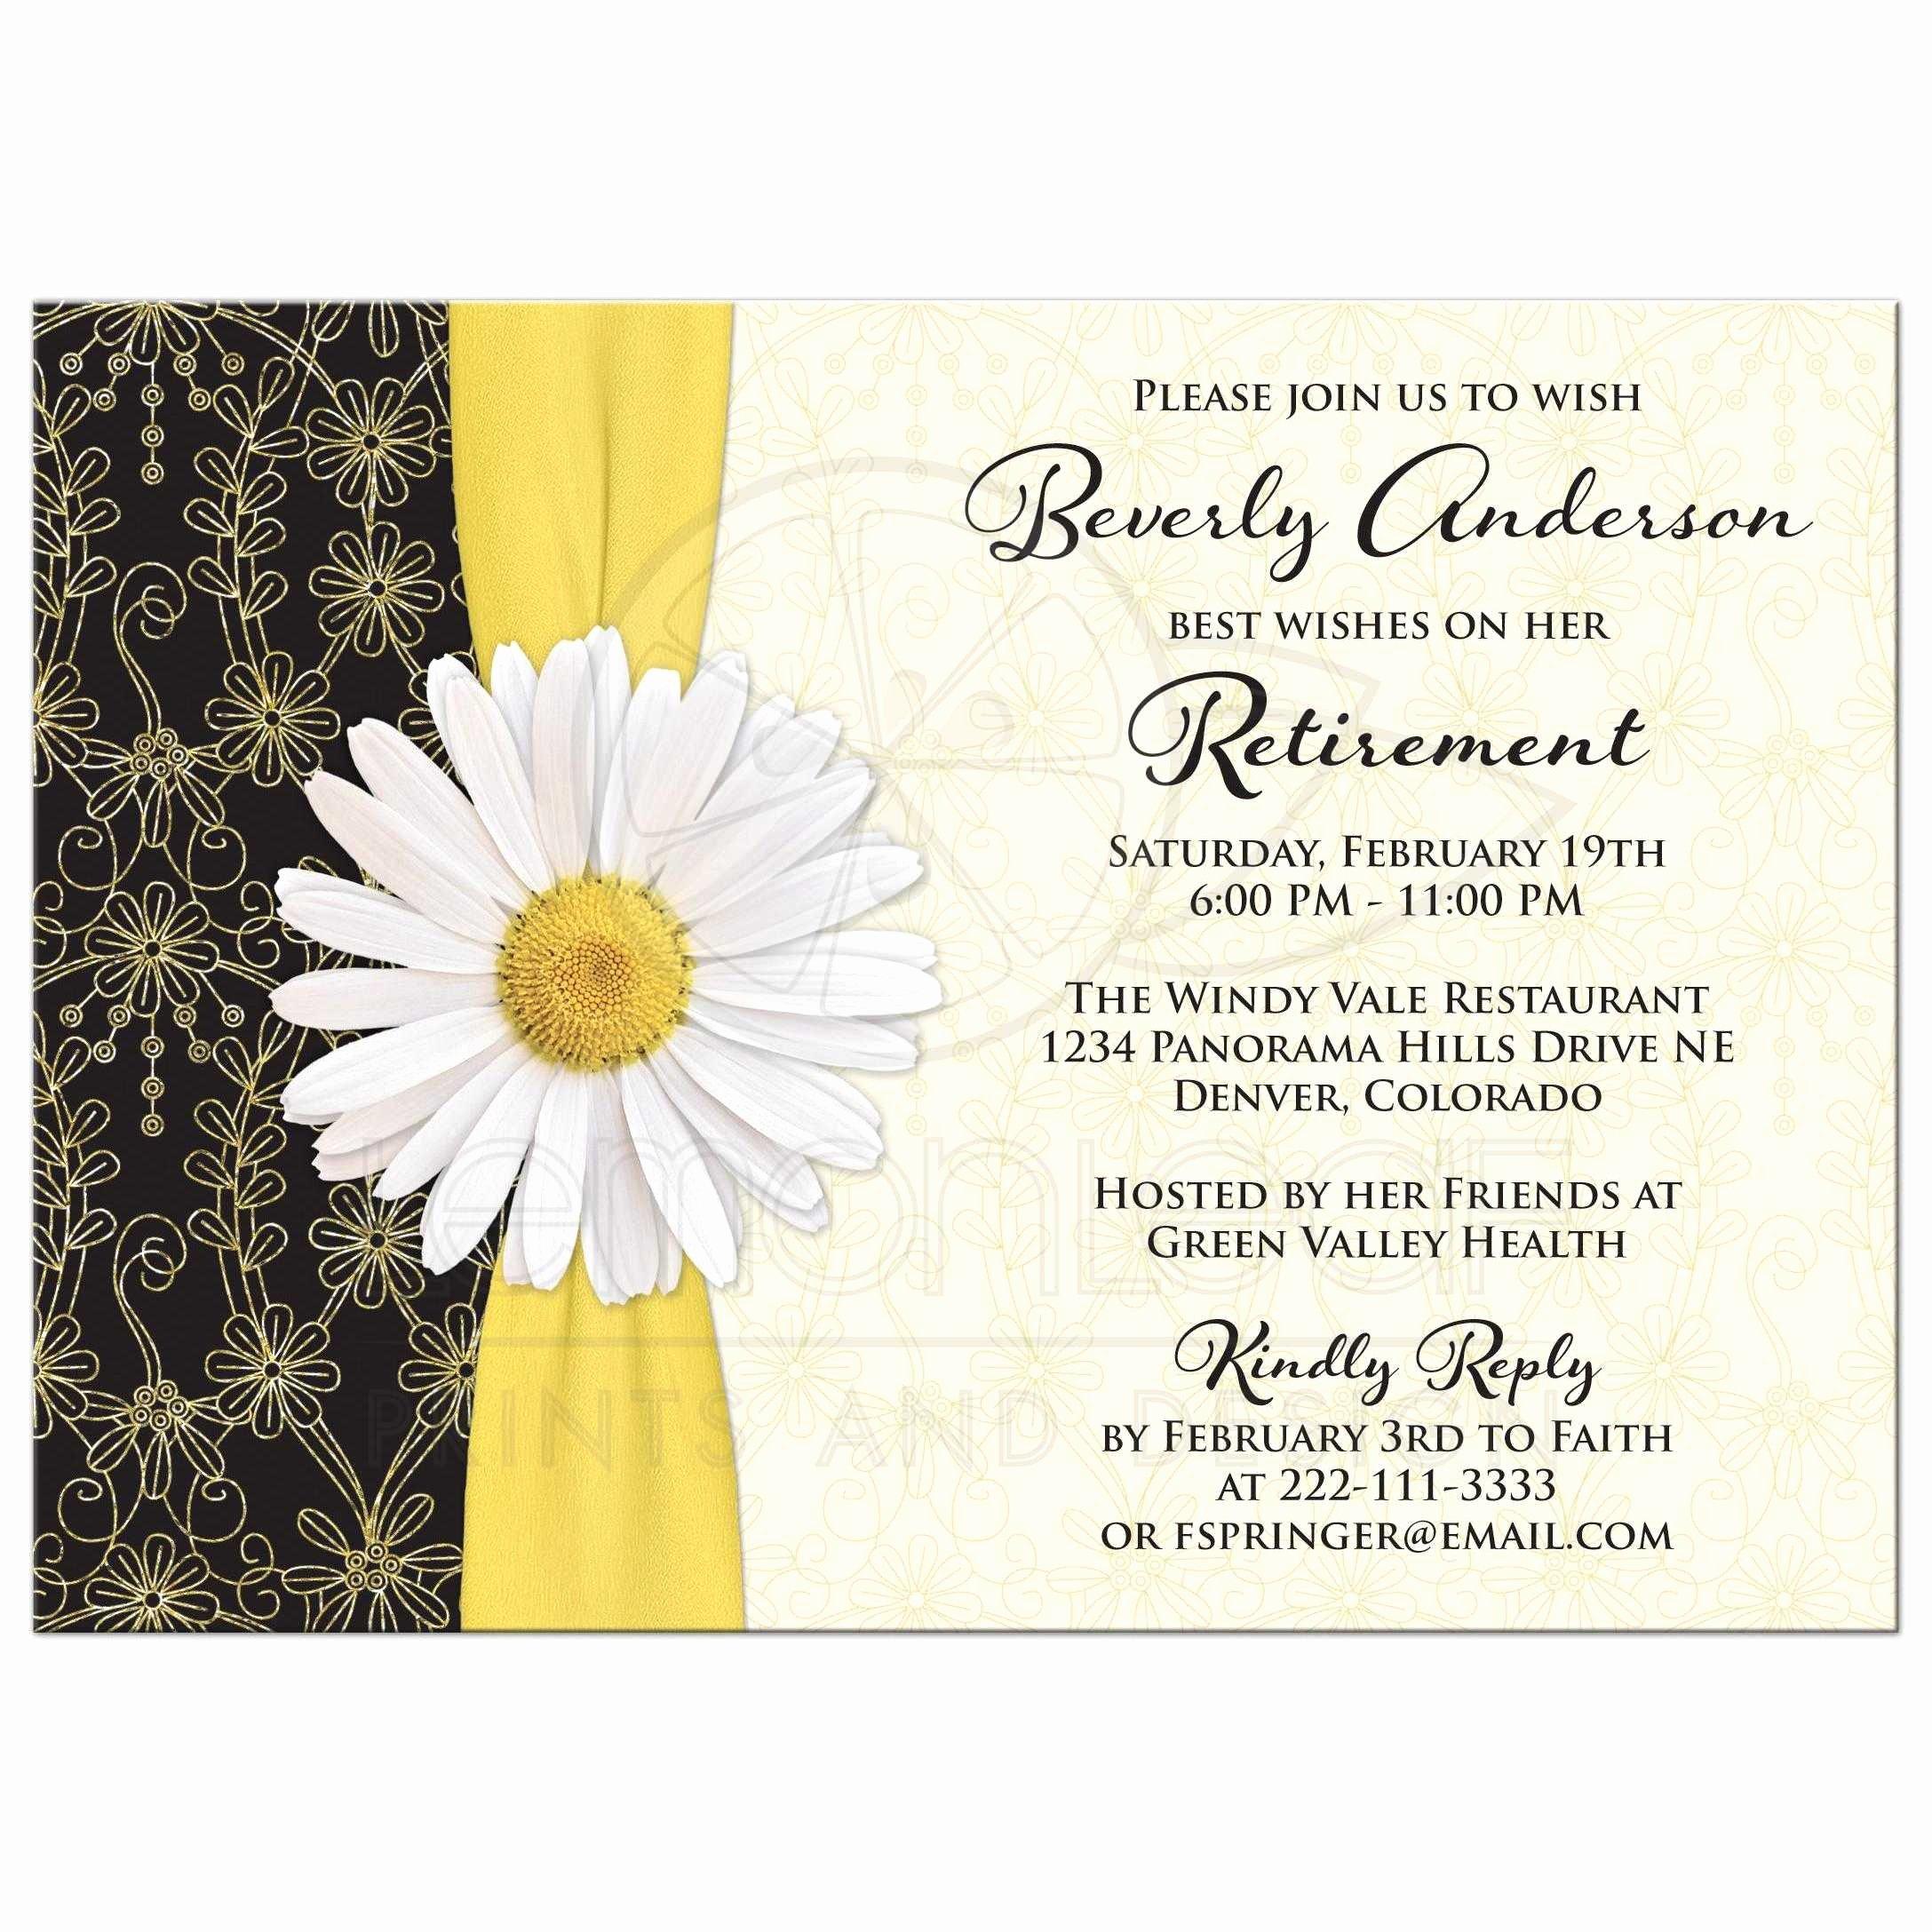 Retirement Party Invitations Templates Unique Retirement Party Invitation